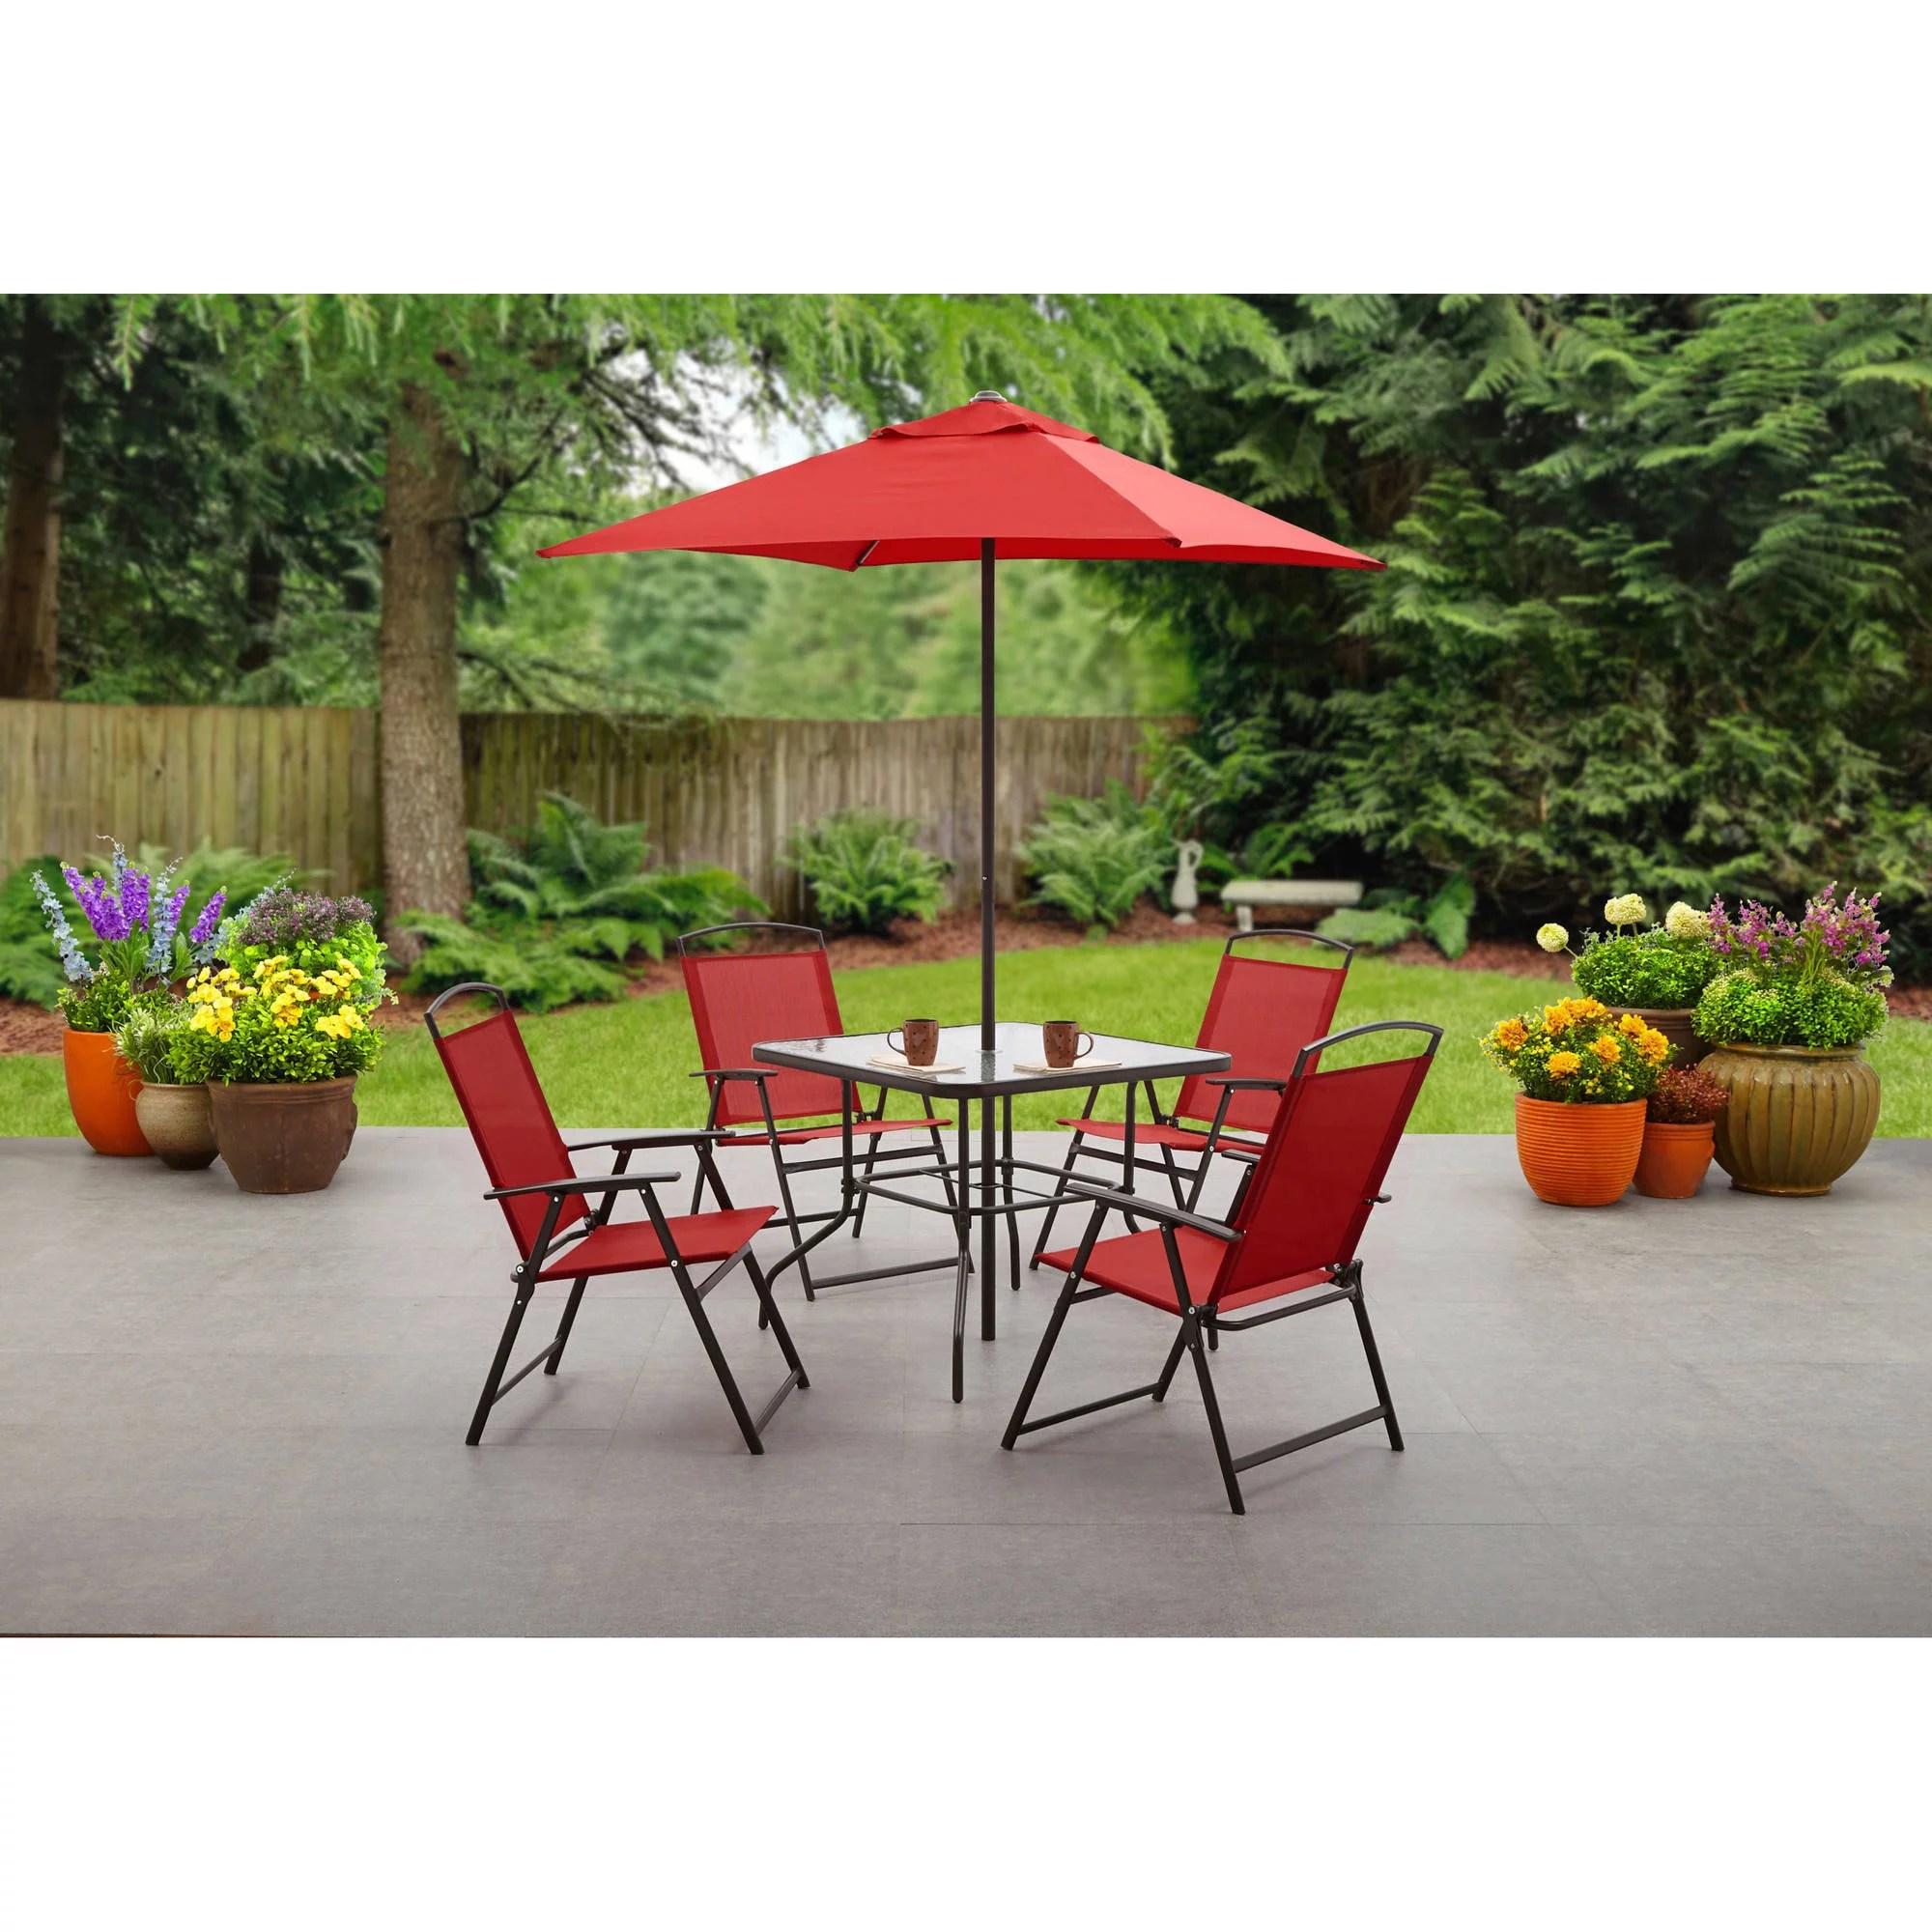 mainstays albany lane 6 piece outdoor patio dining set red walmart com